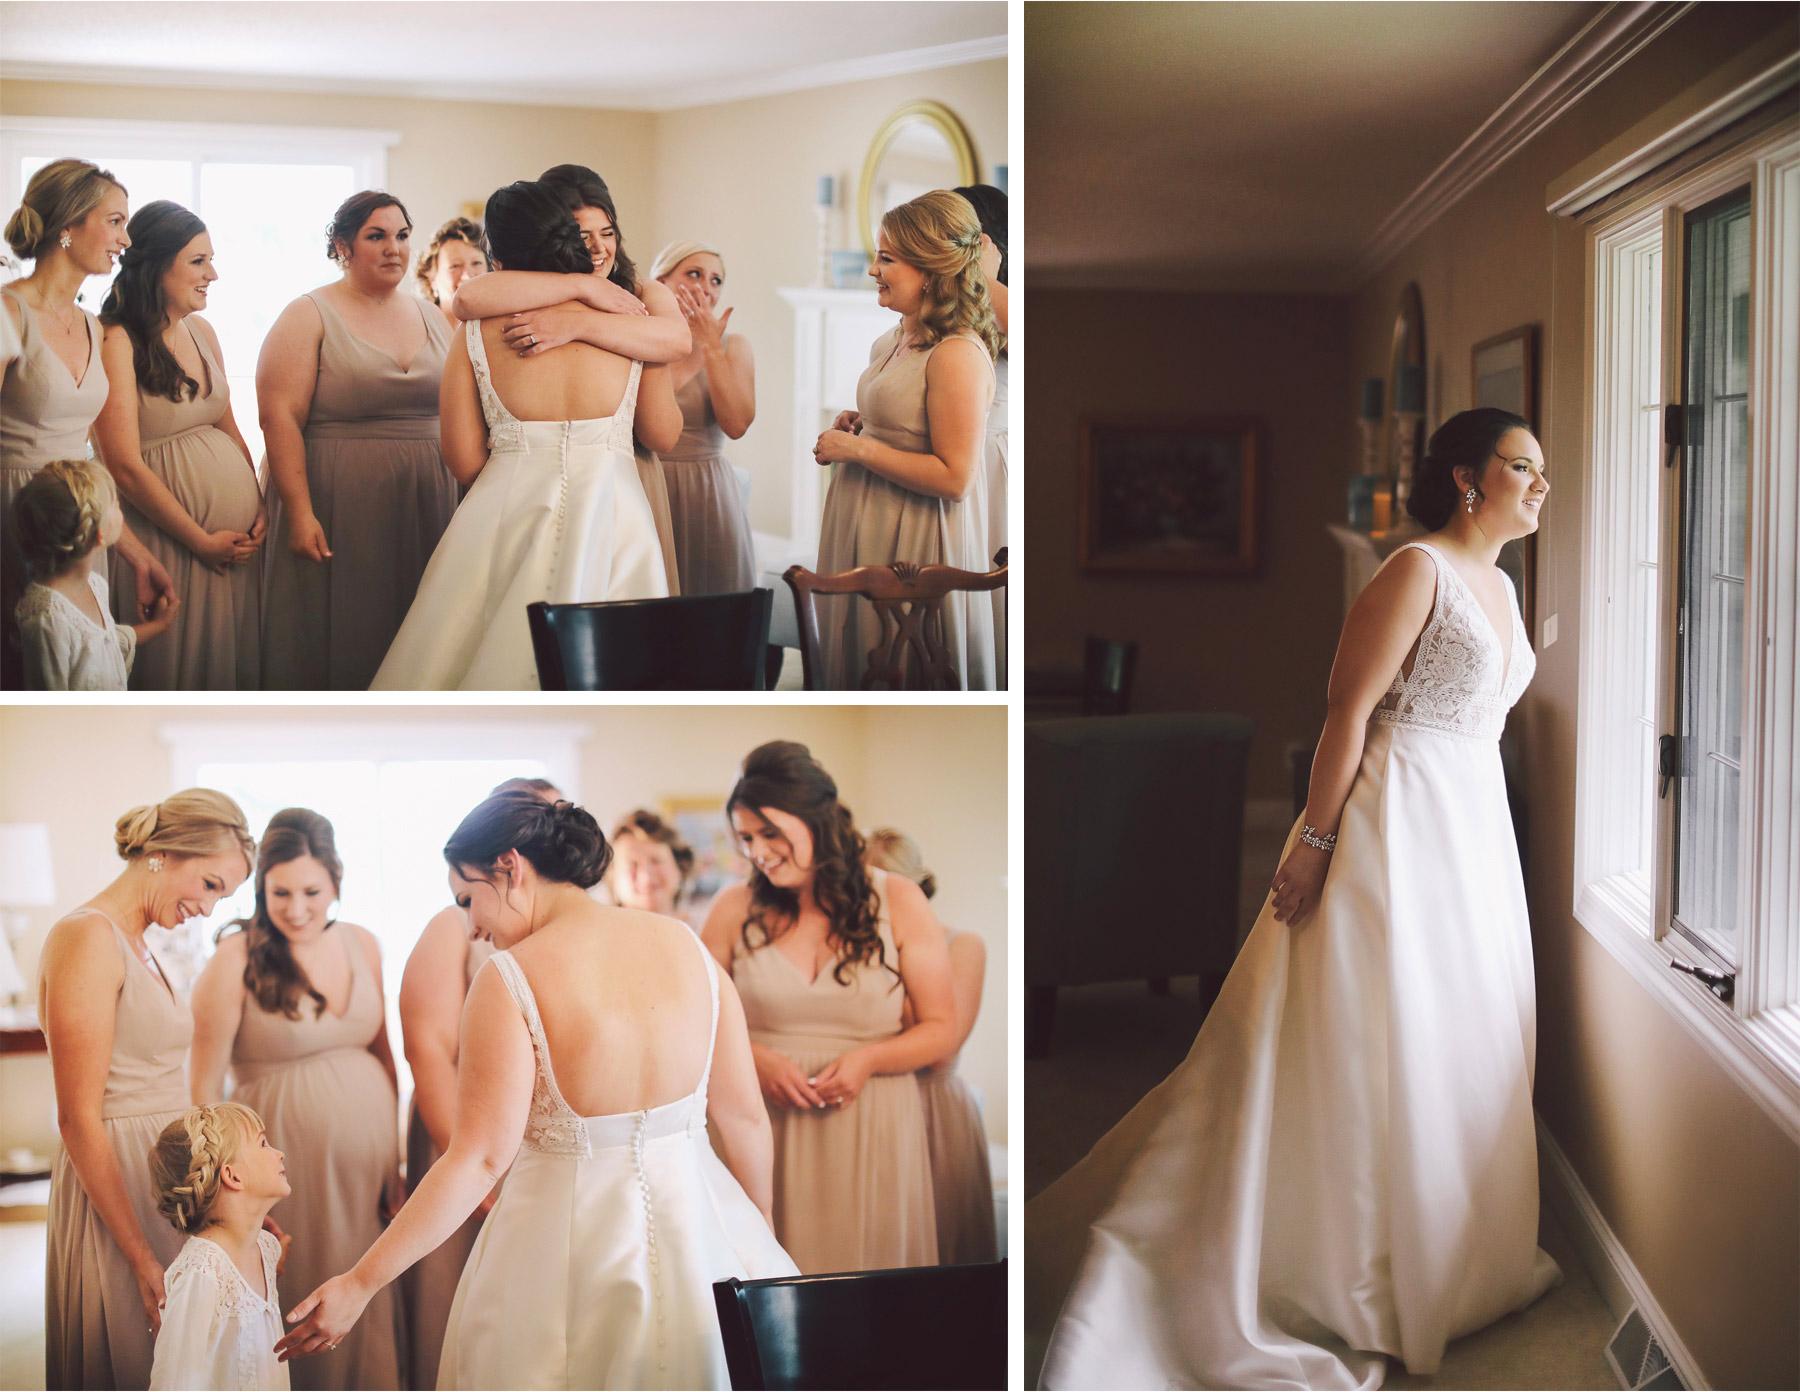 03-Vick-Photography-Wedding-Minneapolis-Minnesota-Bride-Dress-Bridesmaids-Erin-and-David.jpg